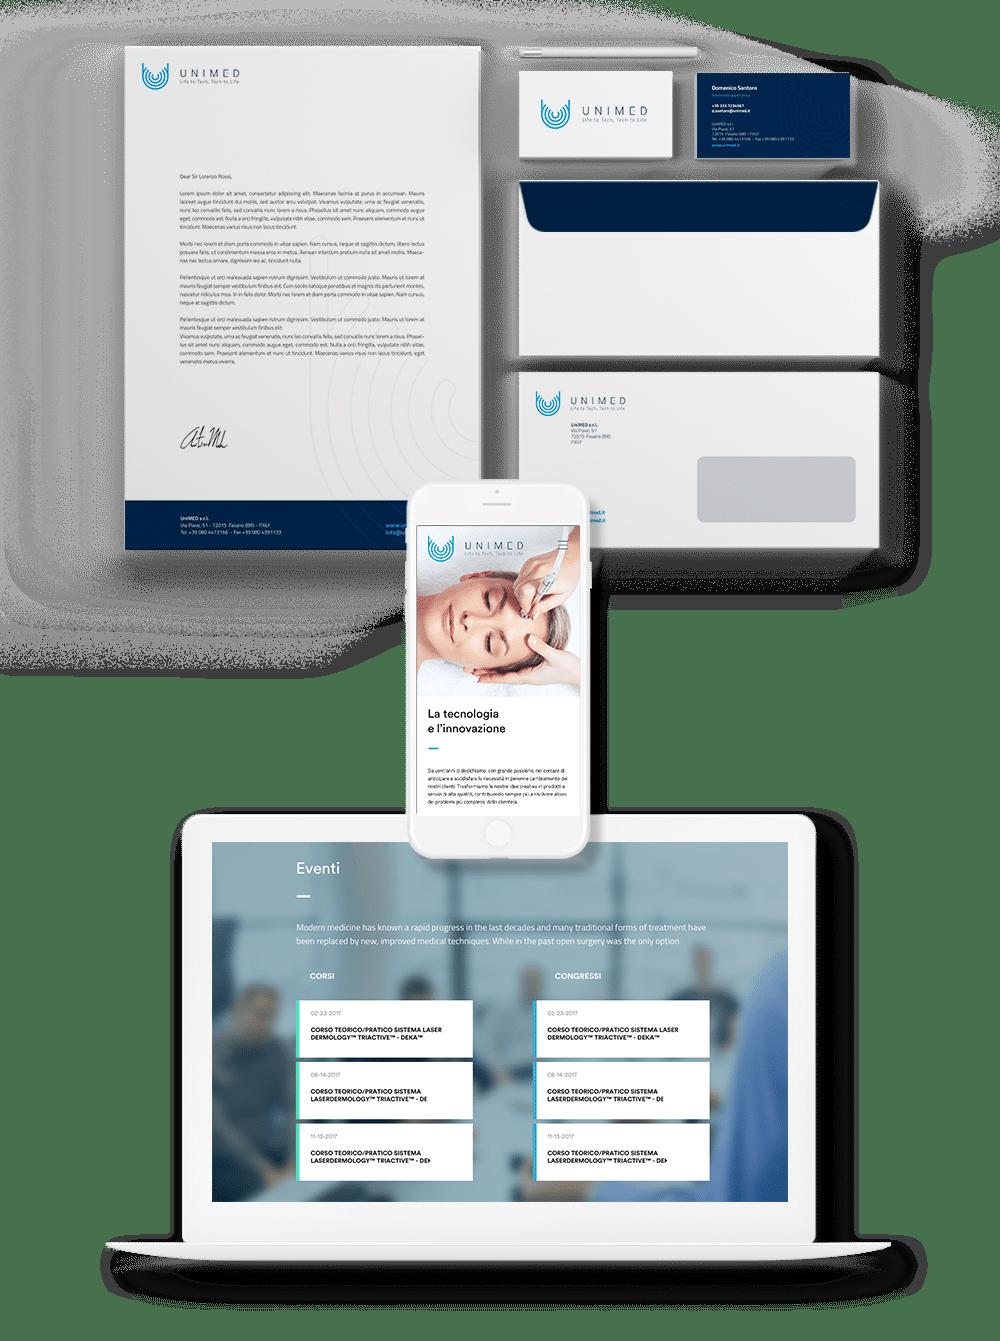 unimed mockup web design